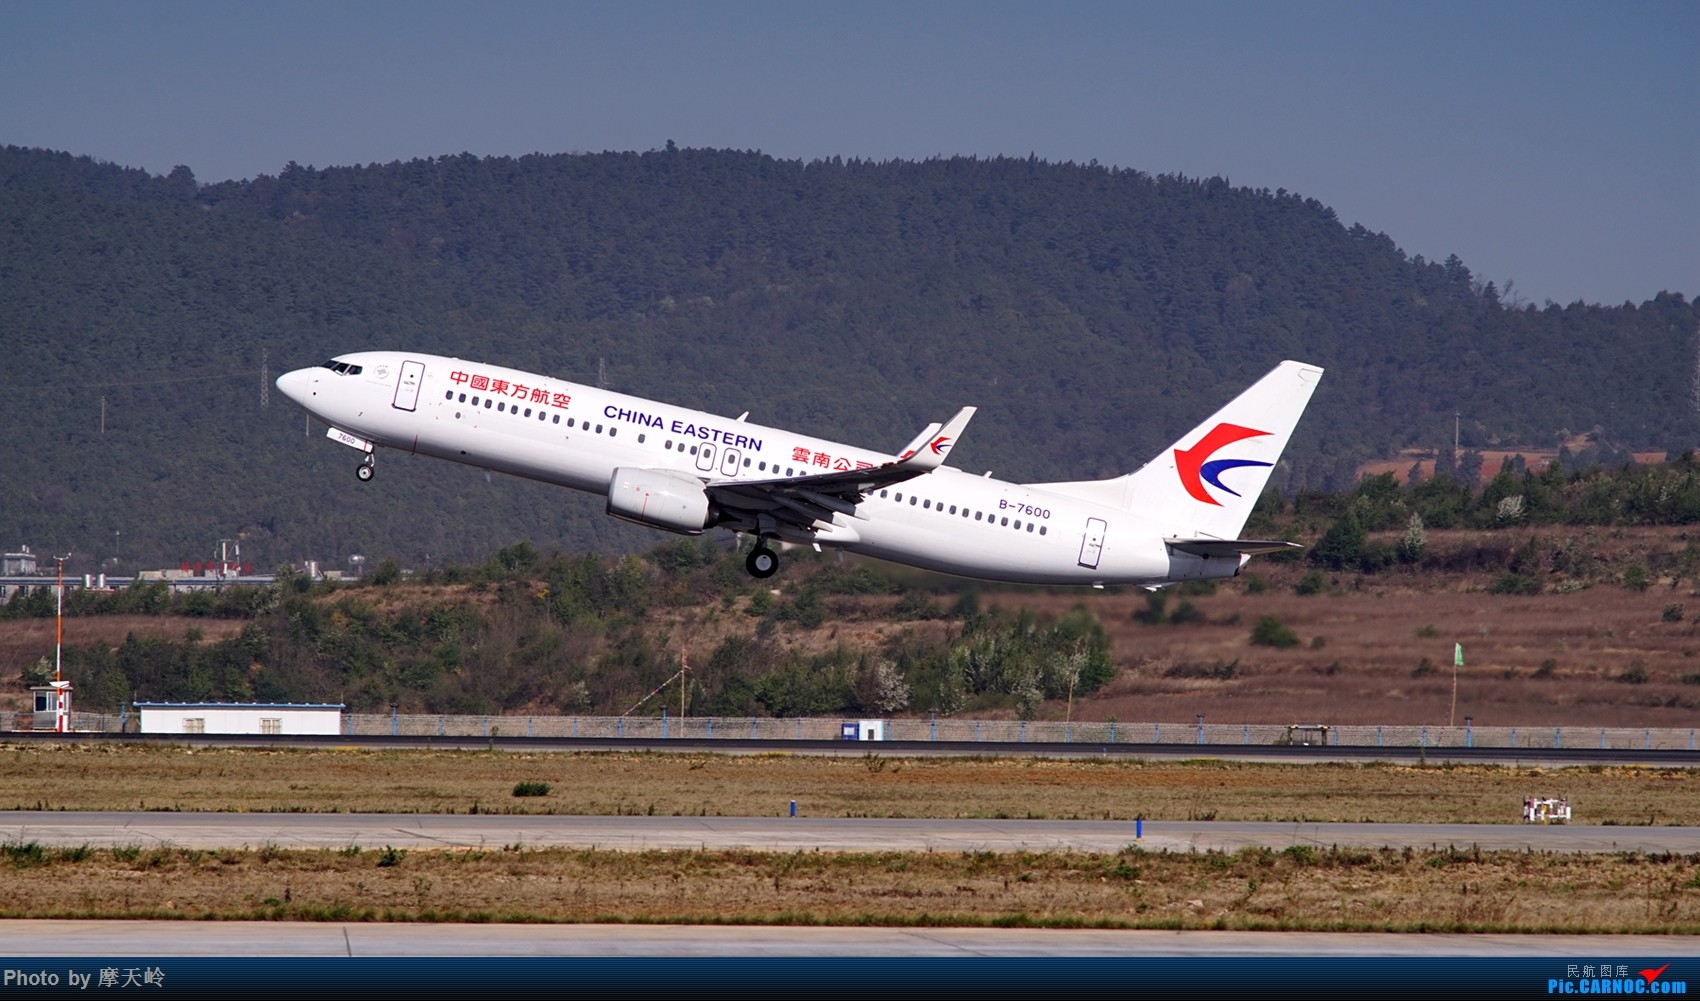 Re:[原创]【昆明长水】内场拍拍拍 BOEING 737-800 B-7600 中国昆明长水国际机场